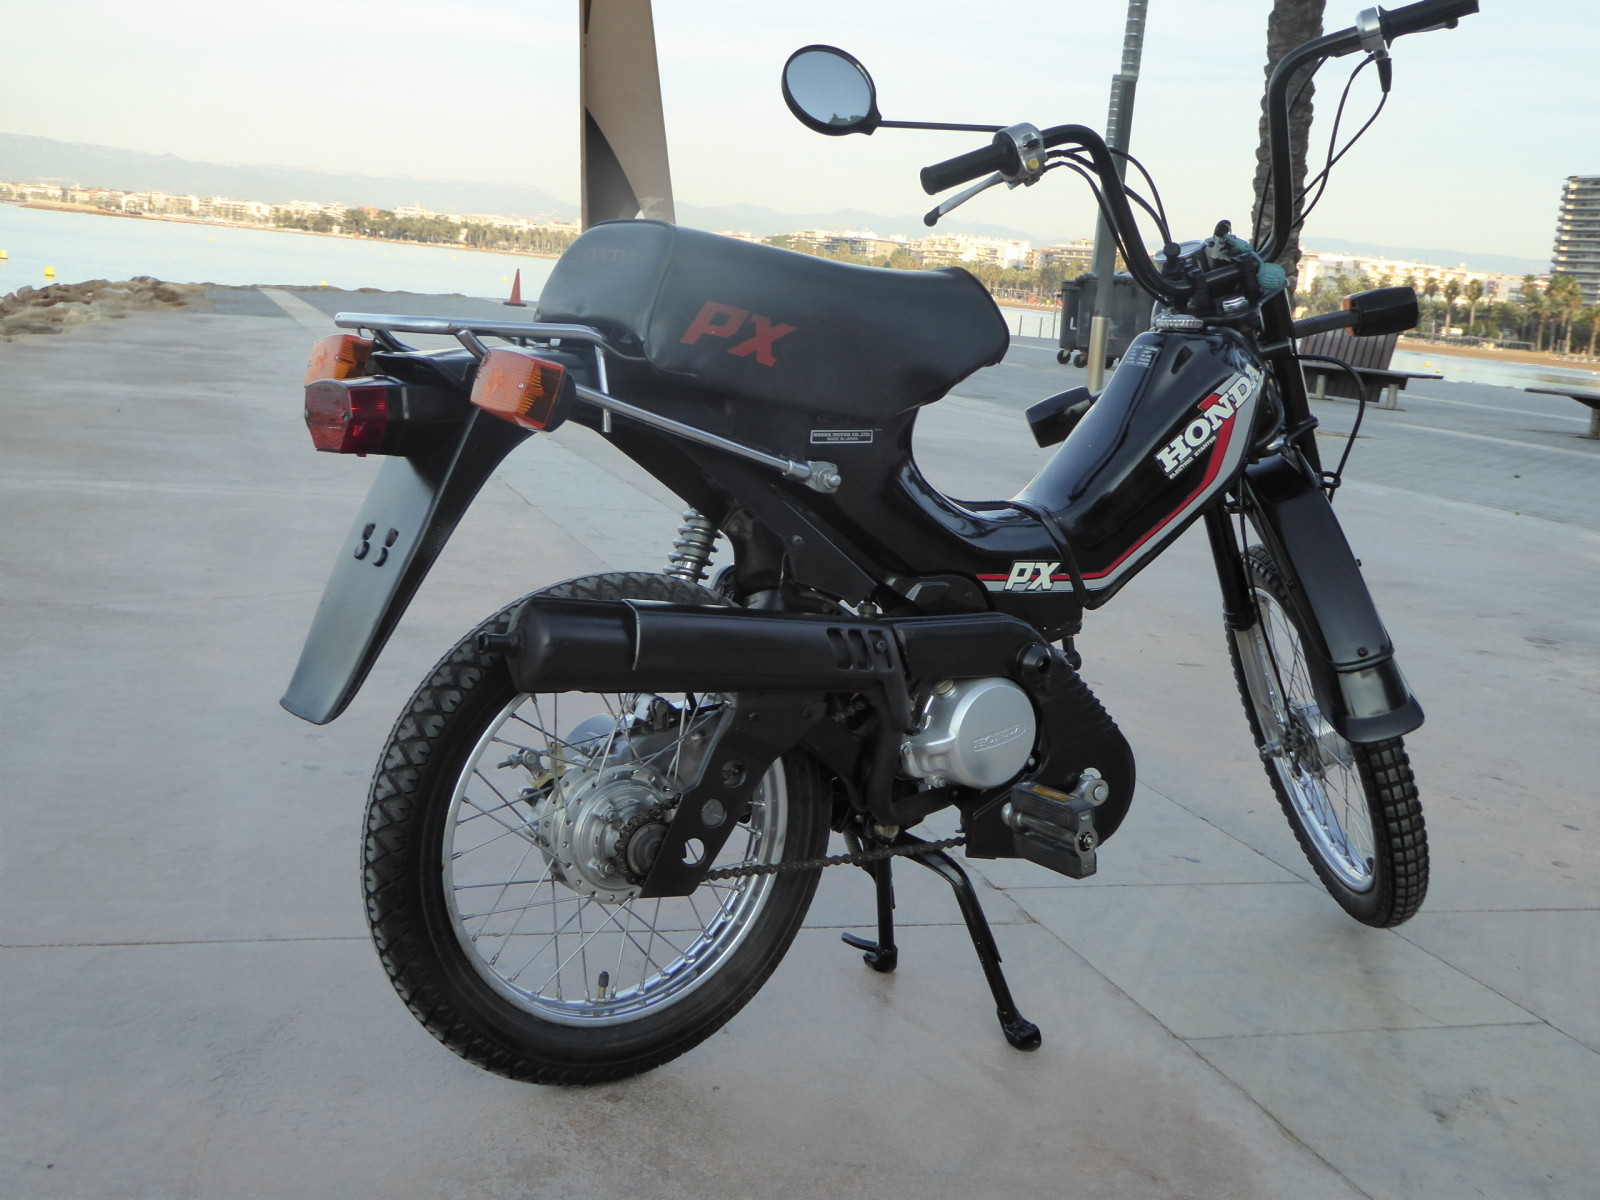 HONDA -  Mi Honda PX '84 - Página 2 Dgjh9x